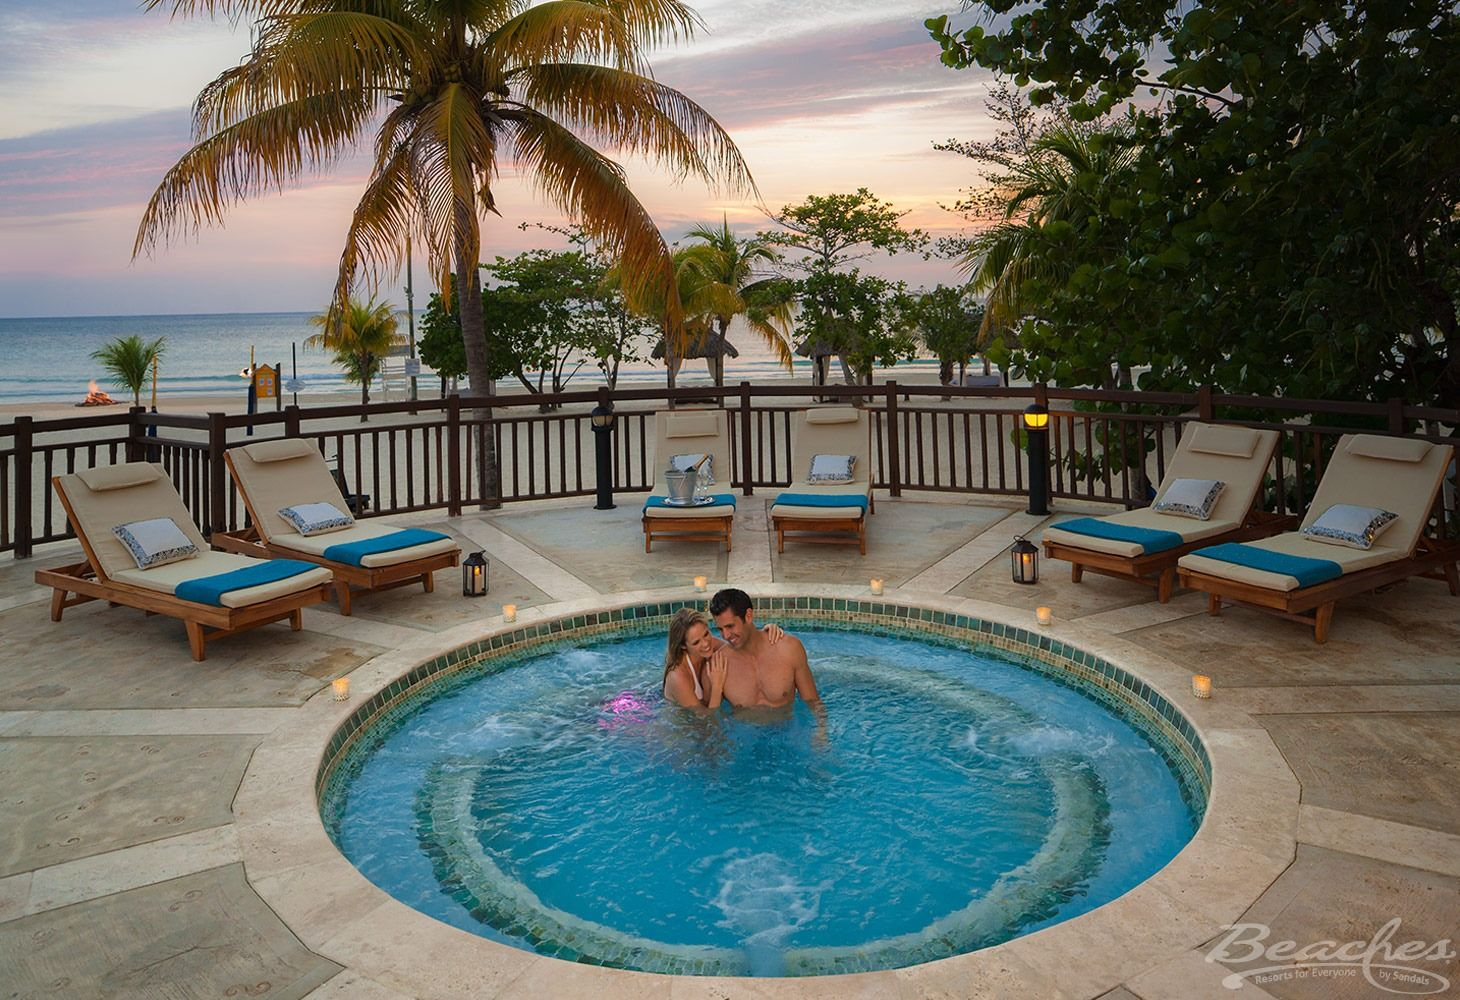 Beaches-negril-hot-tub